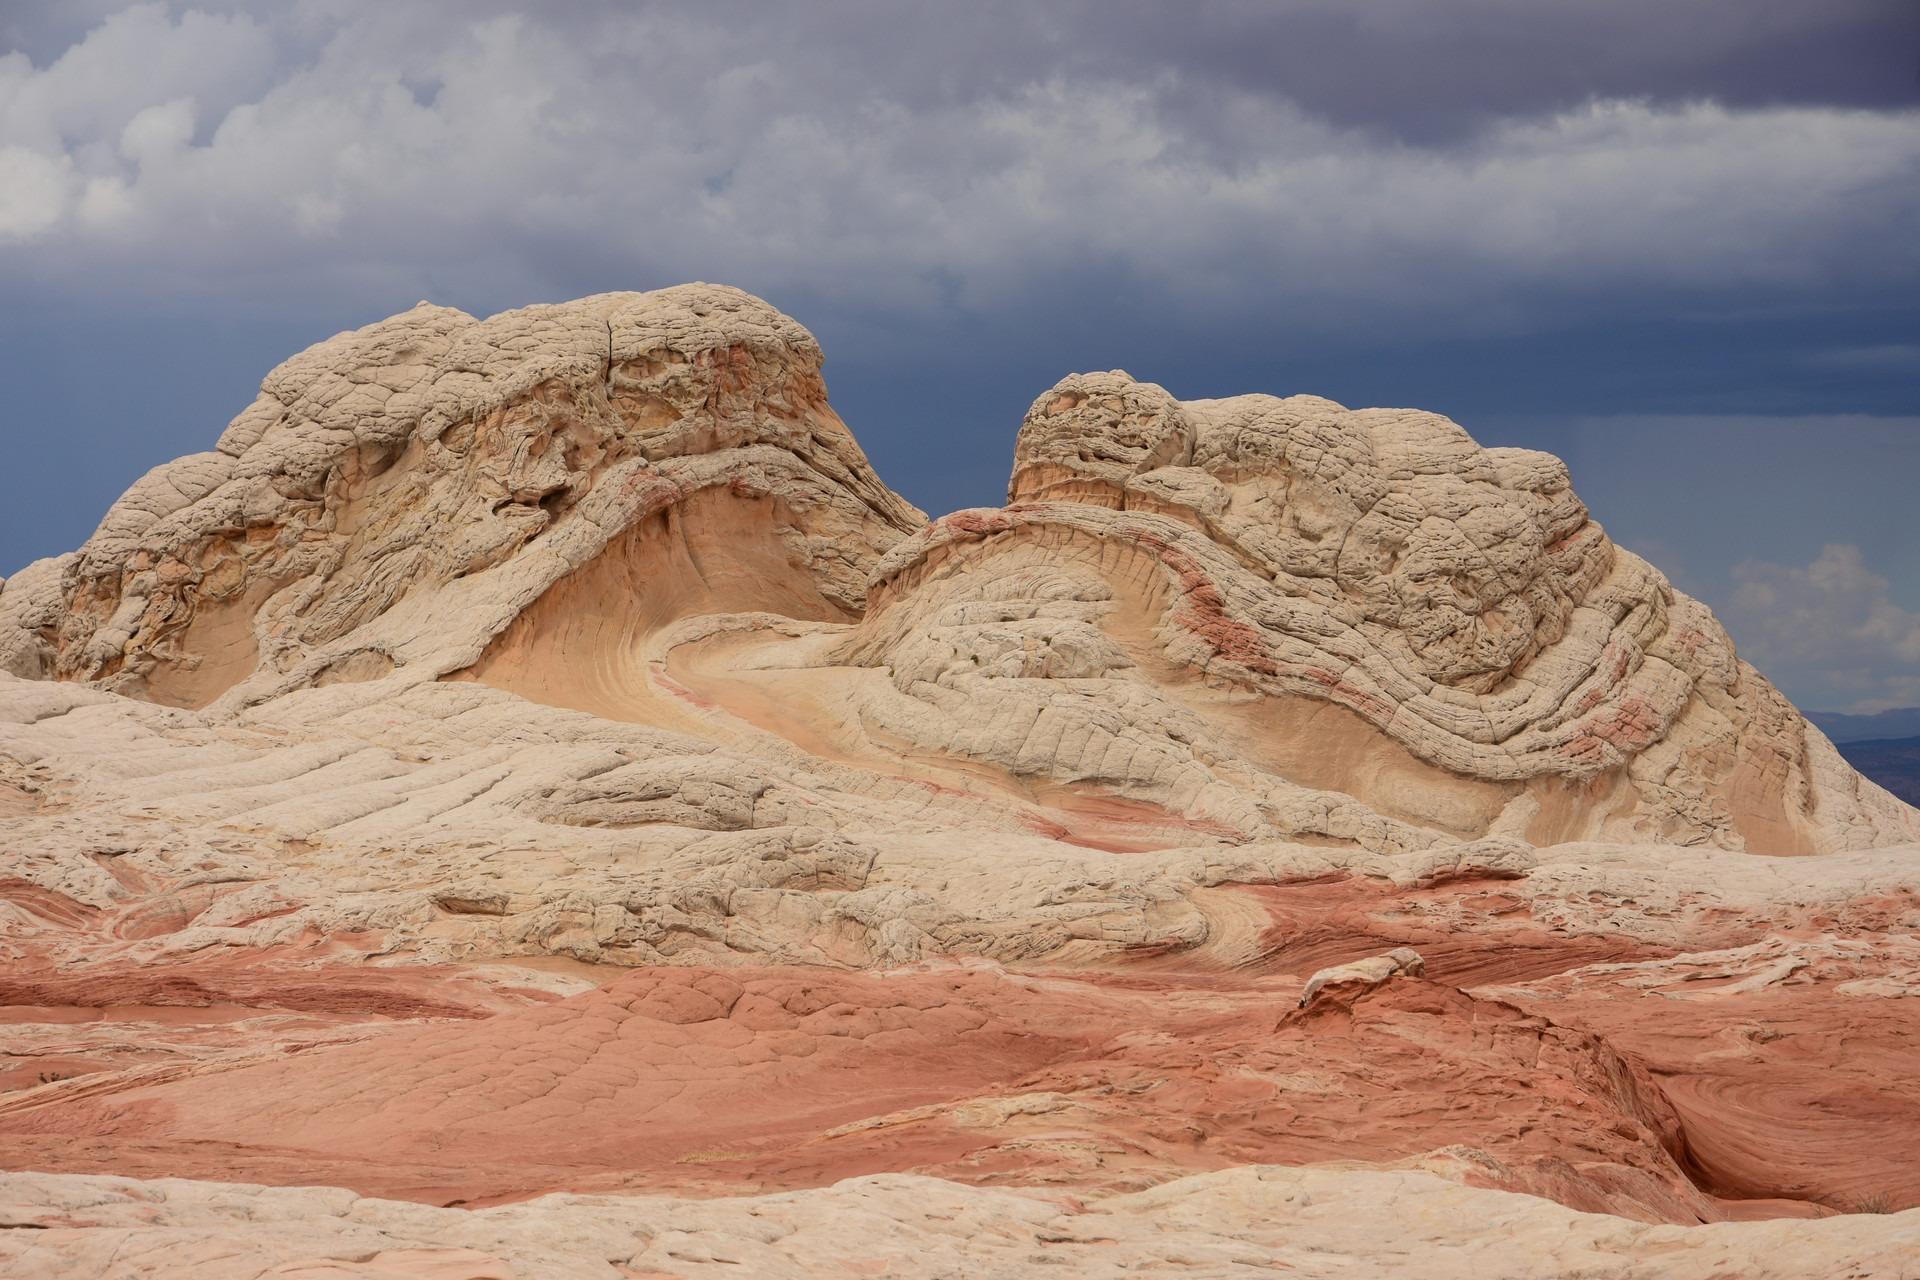 Vermillion Cliffs National Monument – White Pocket